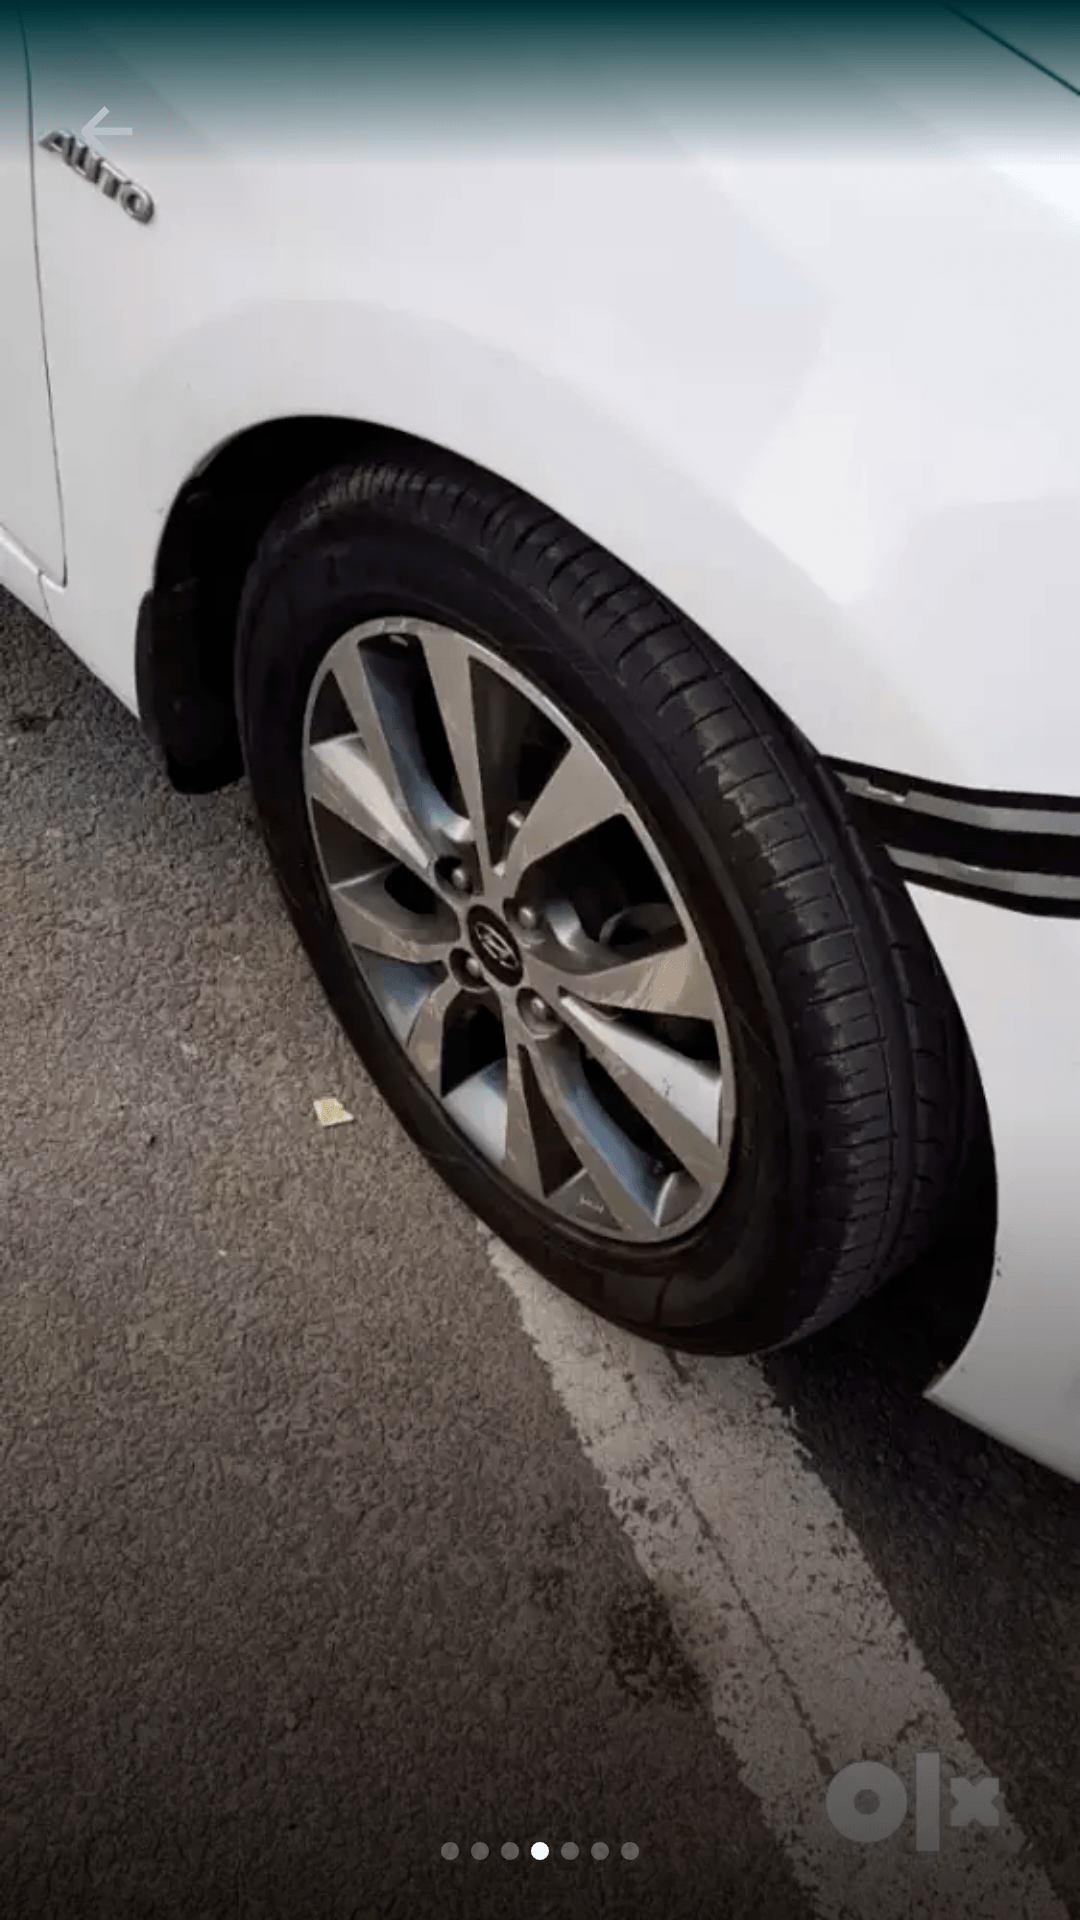 New Hyundai Verna Rear Left Side Angle View